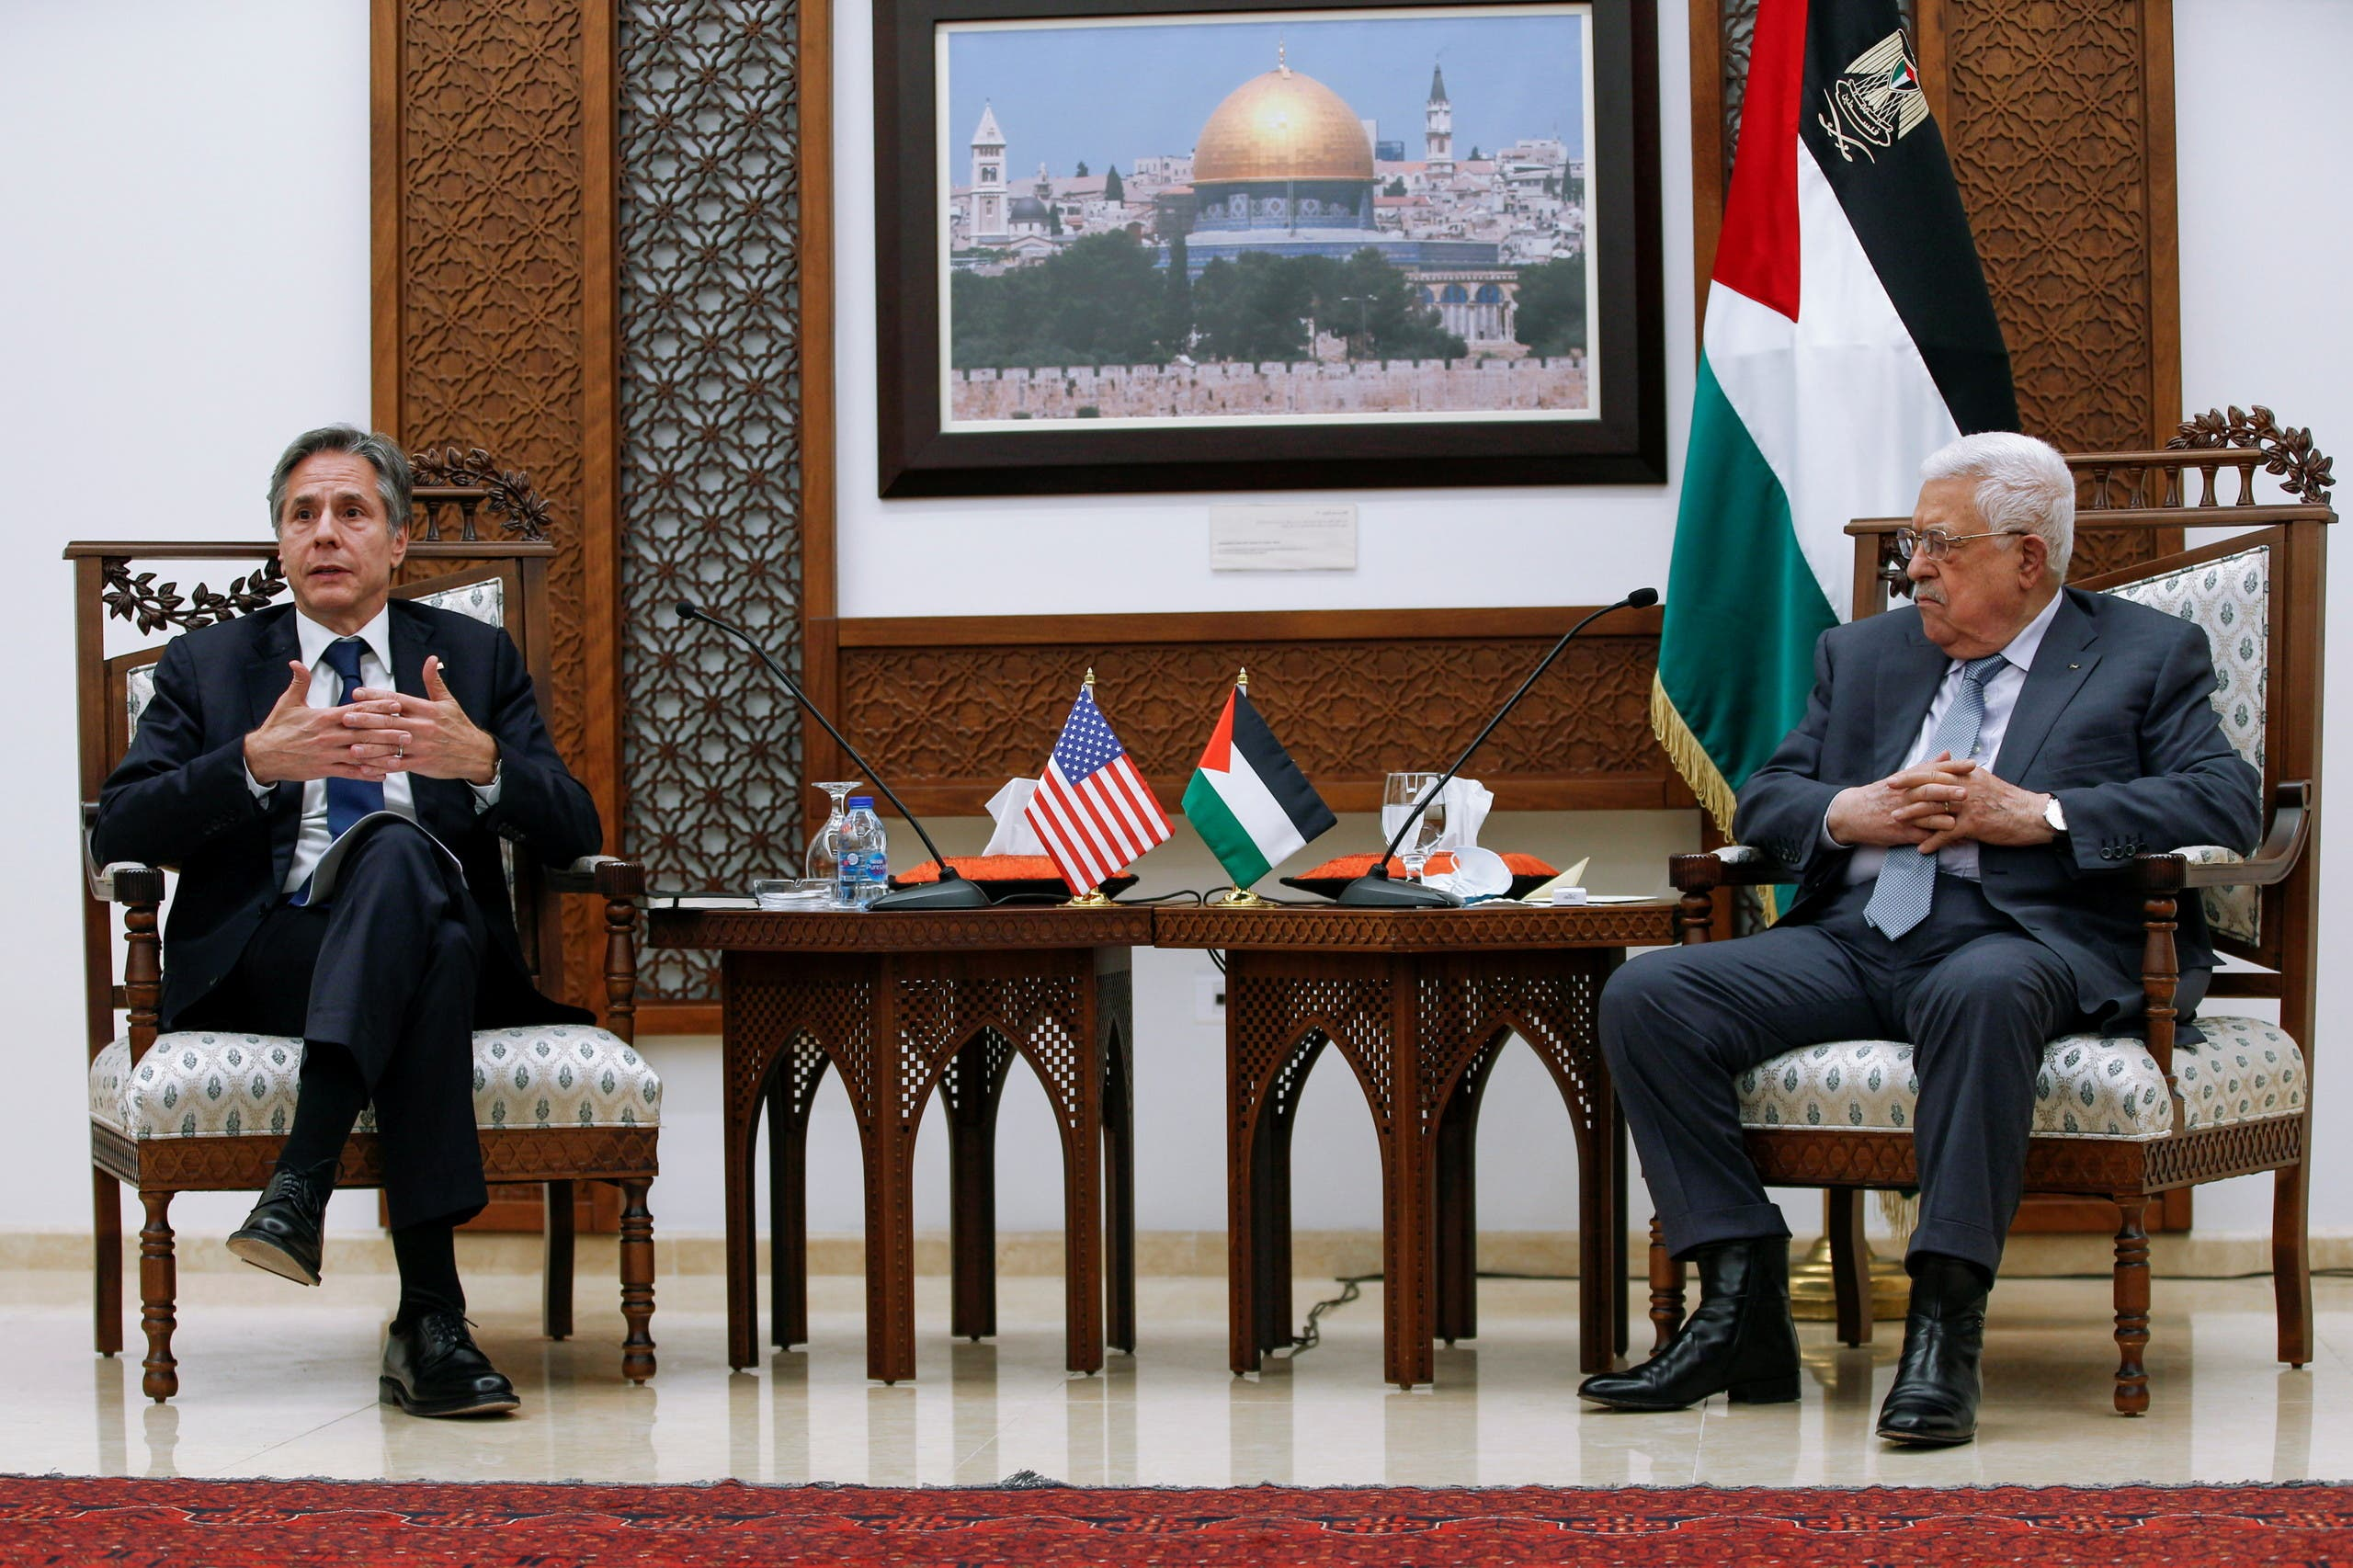 U.S. Secretary of State Antony Blinken speaks with Palestinian President Mahmoud Abbas, in the West Bank city of Ramallah, May 25, 2021. (Reuters)